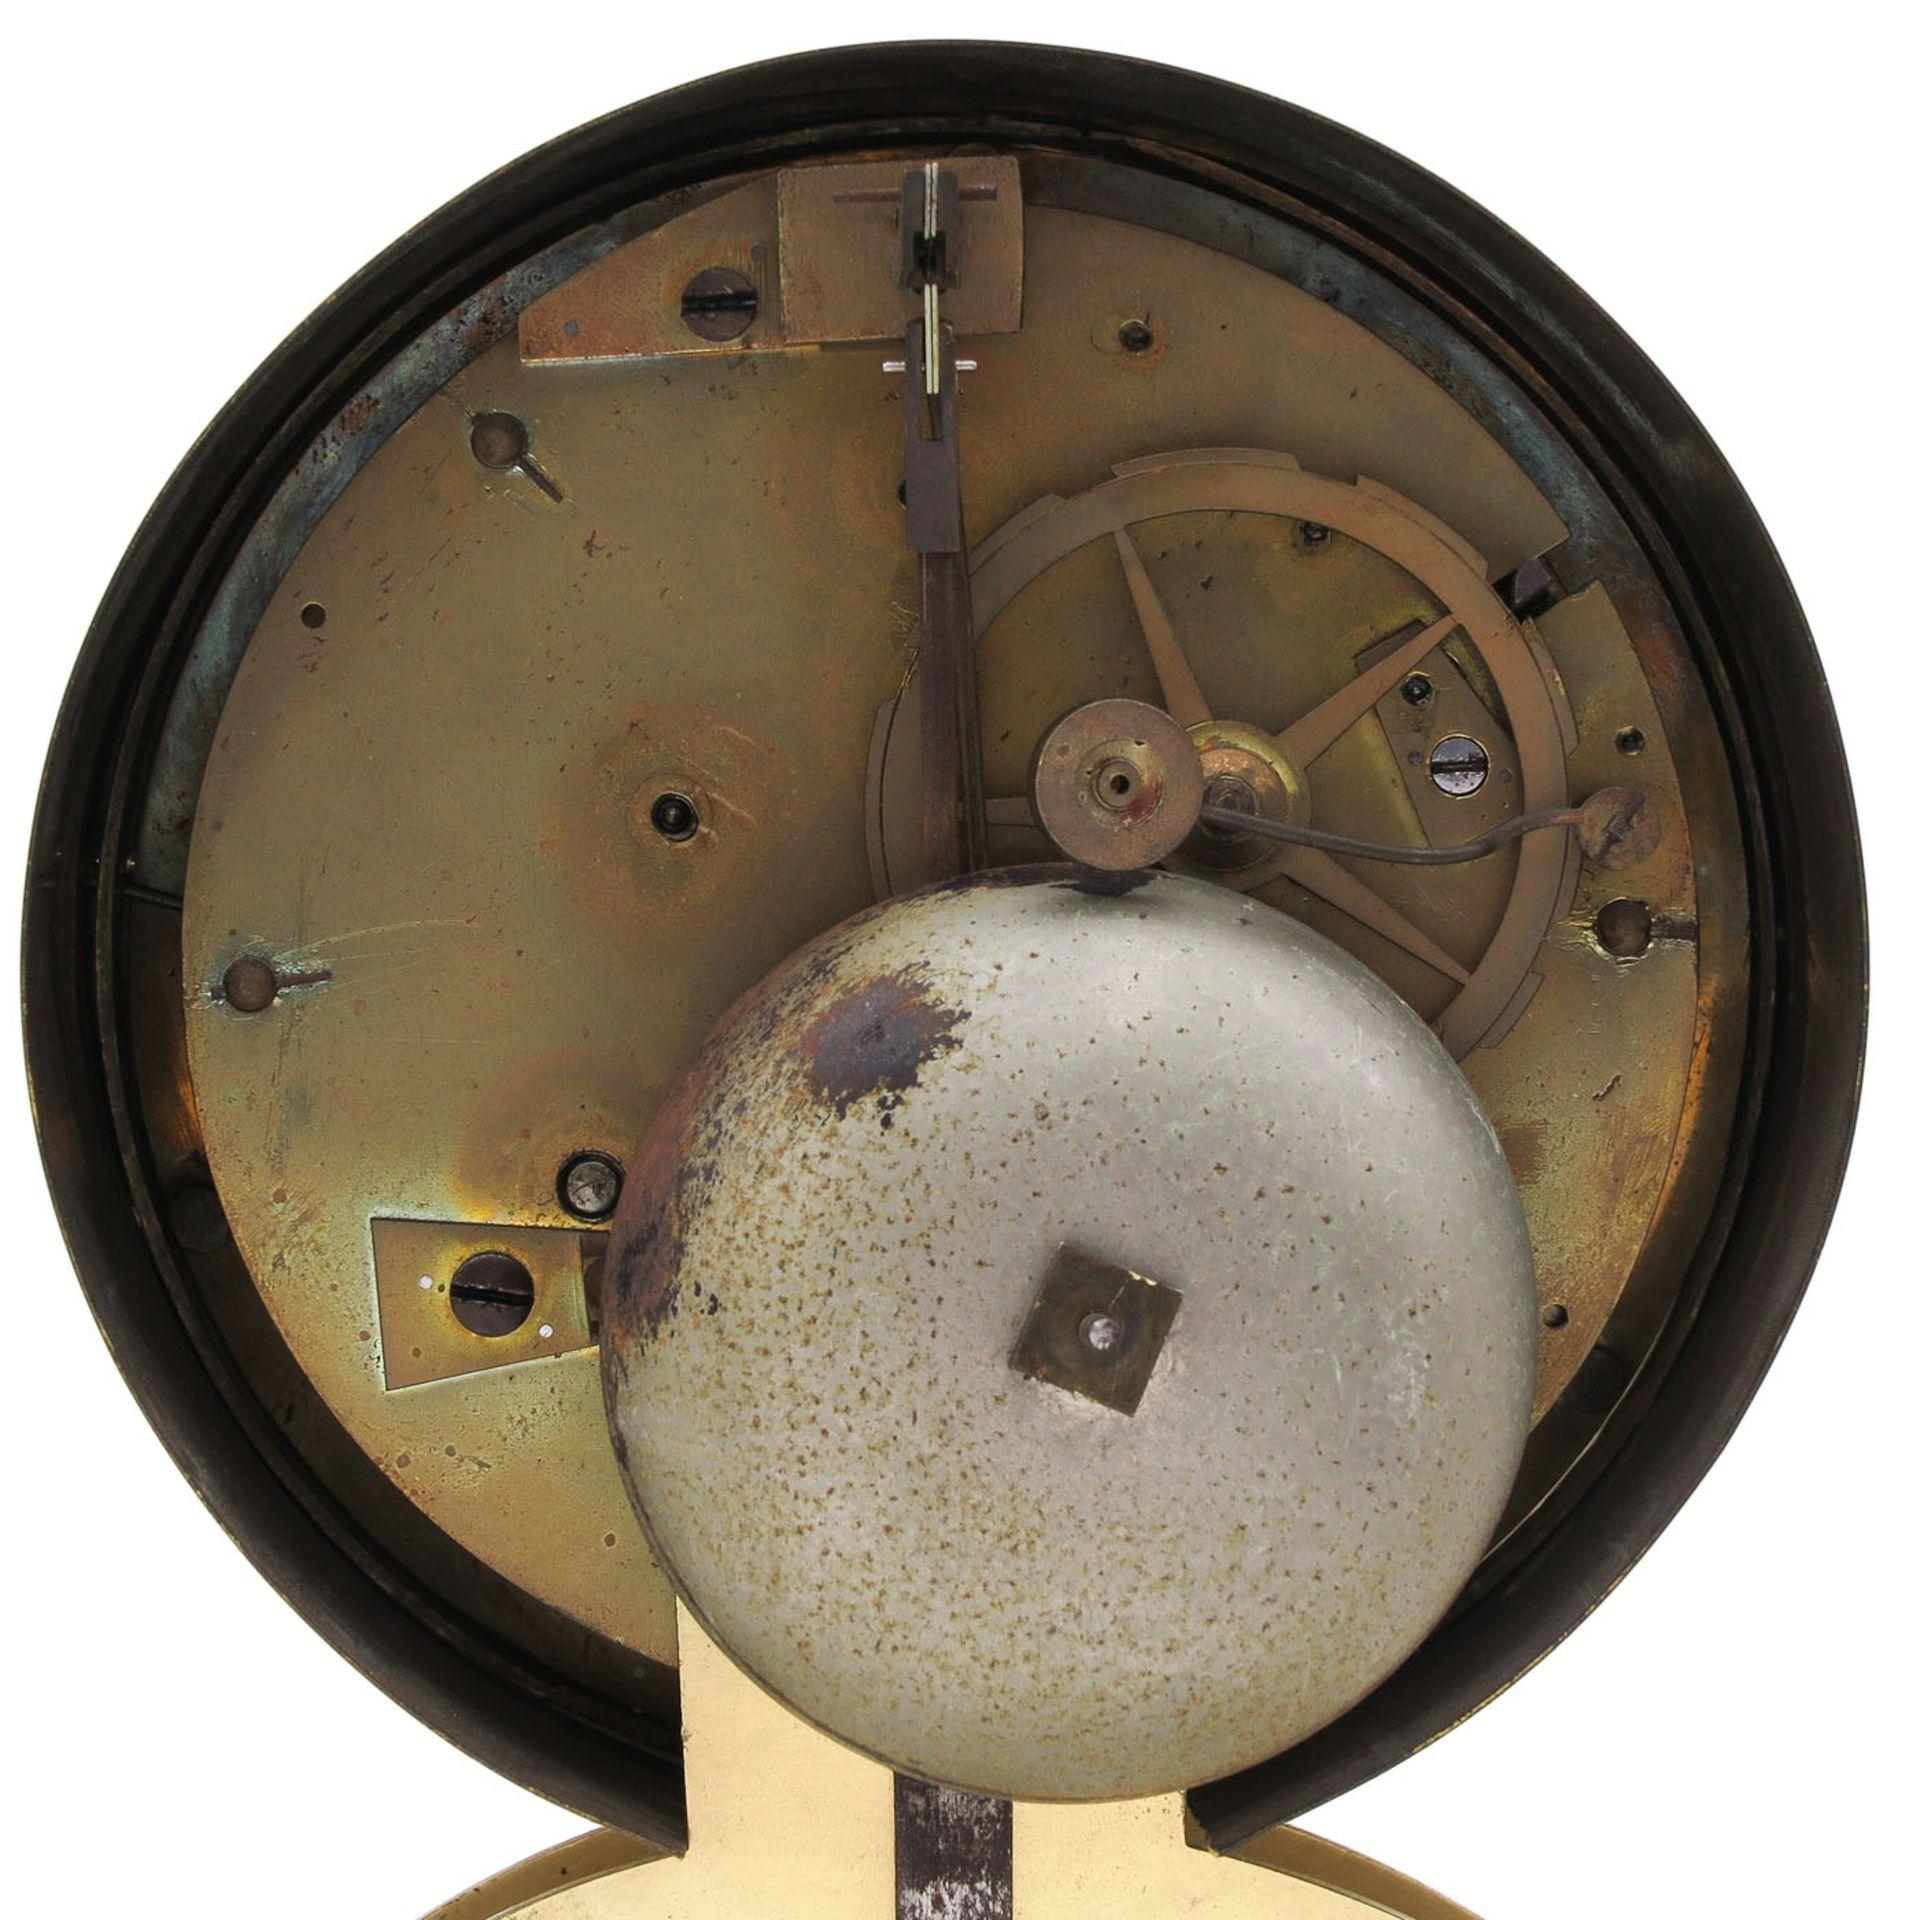 Los 1078 - A 19th Century French Column Clock